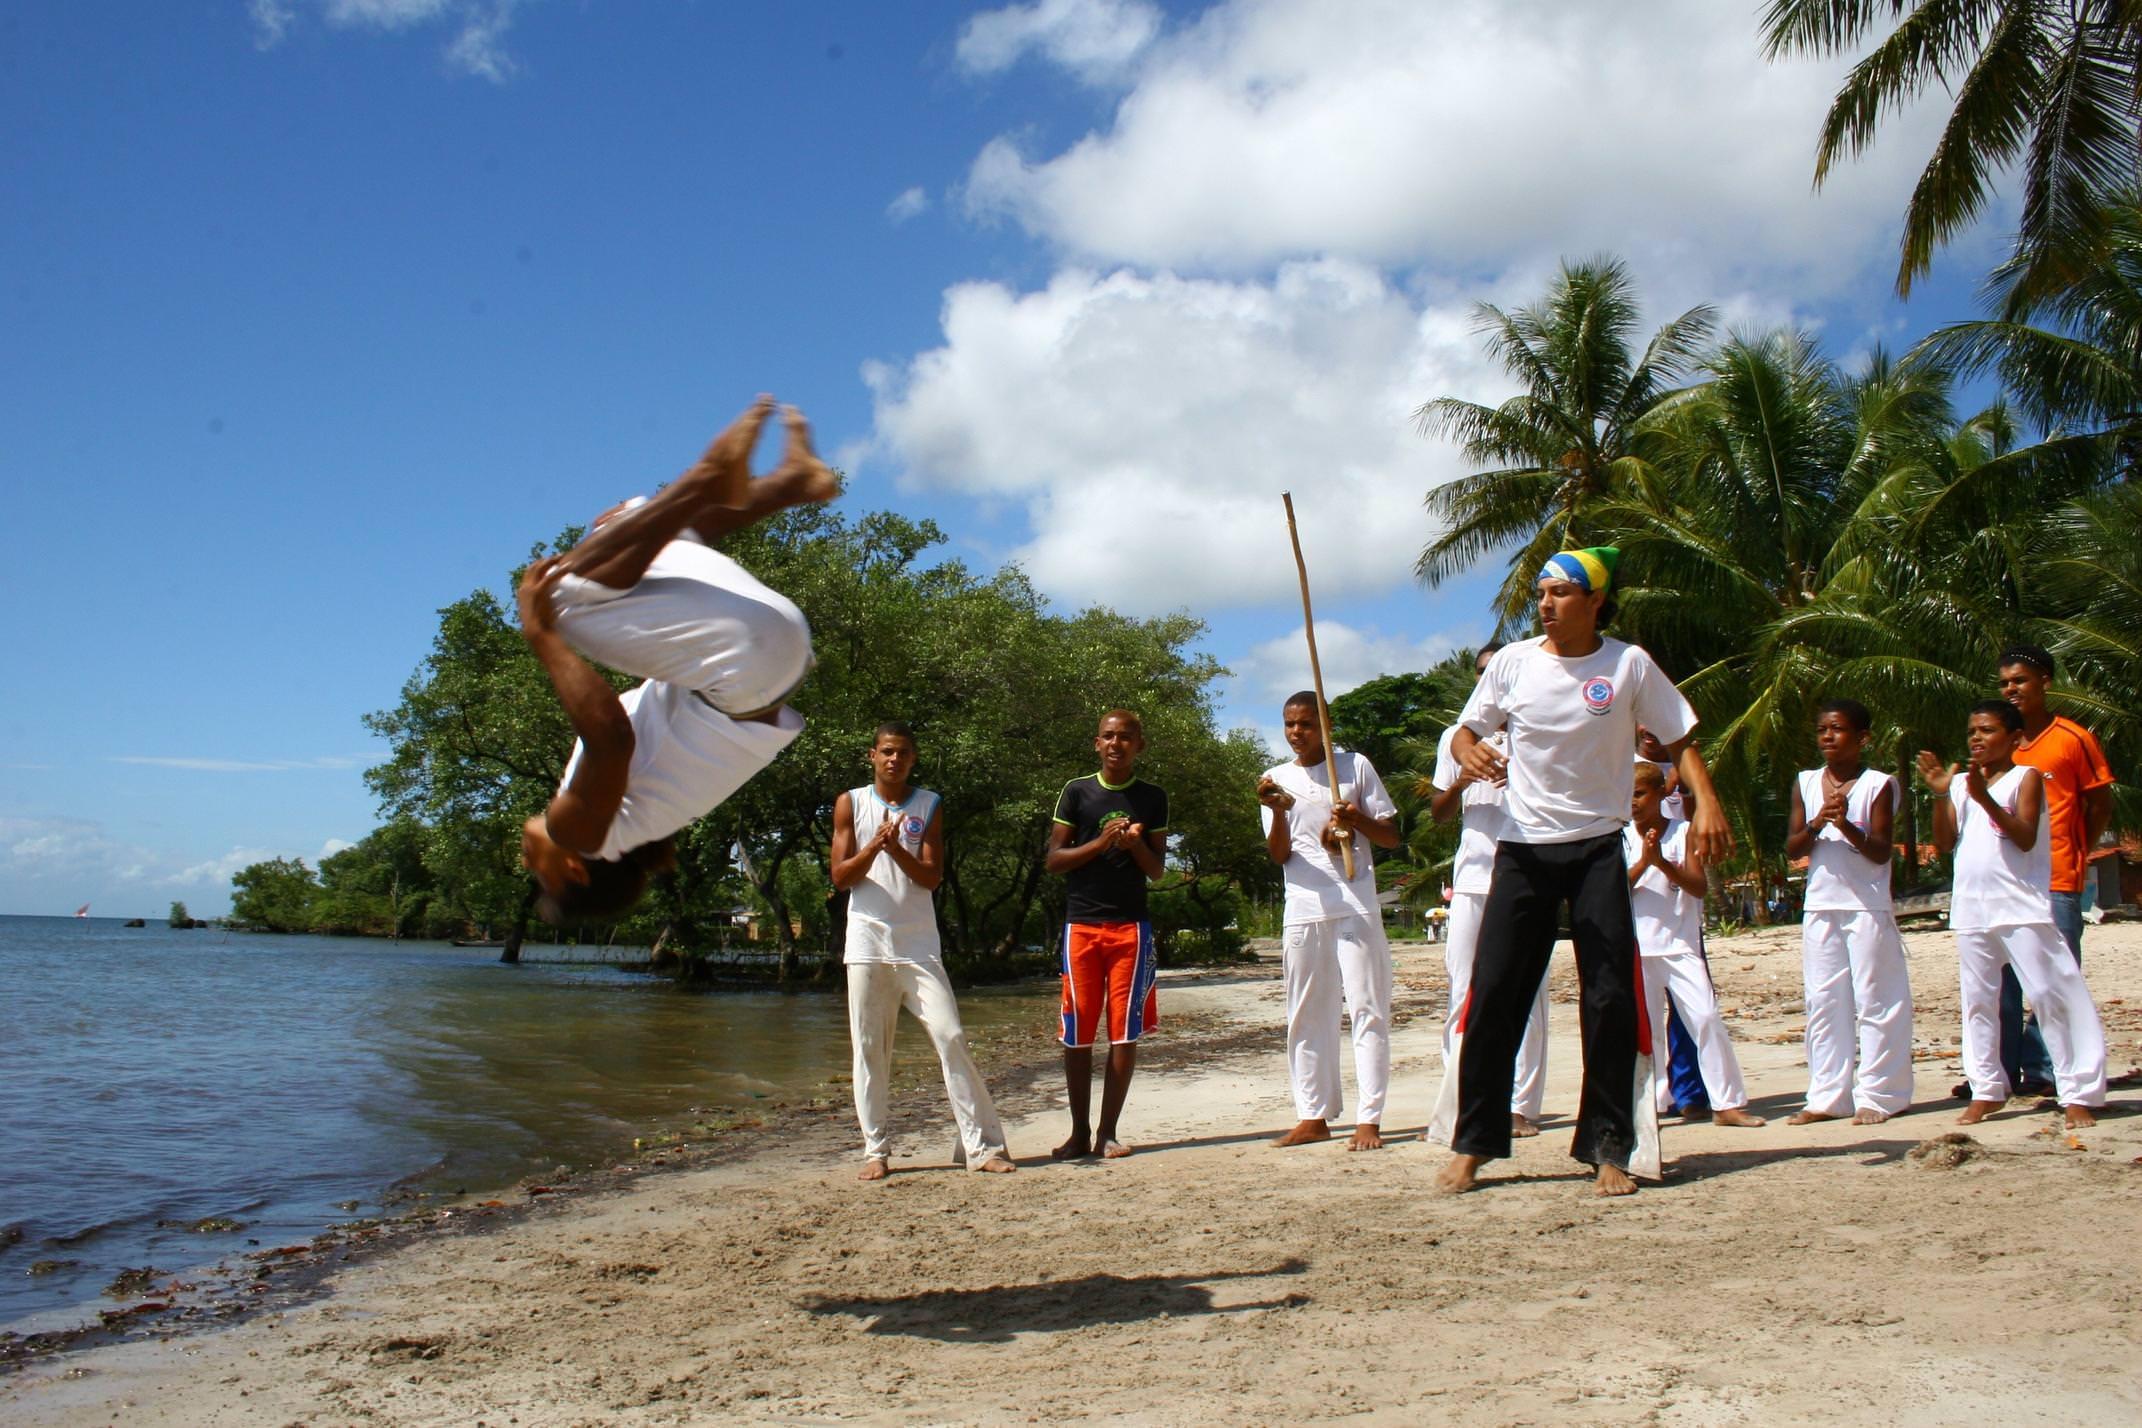 Brazil bahia boipeba island capoeira on beach